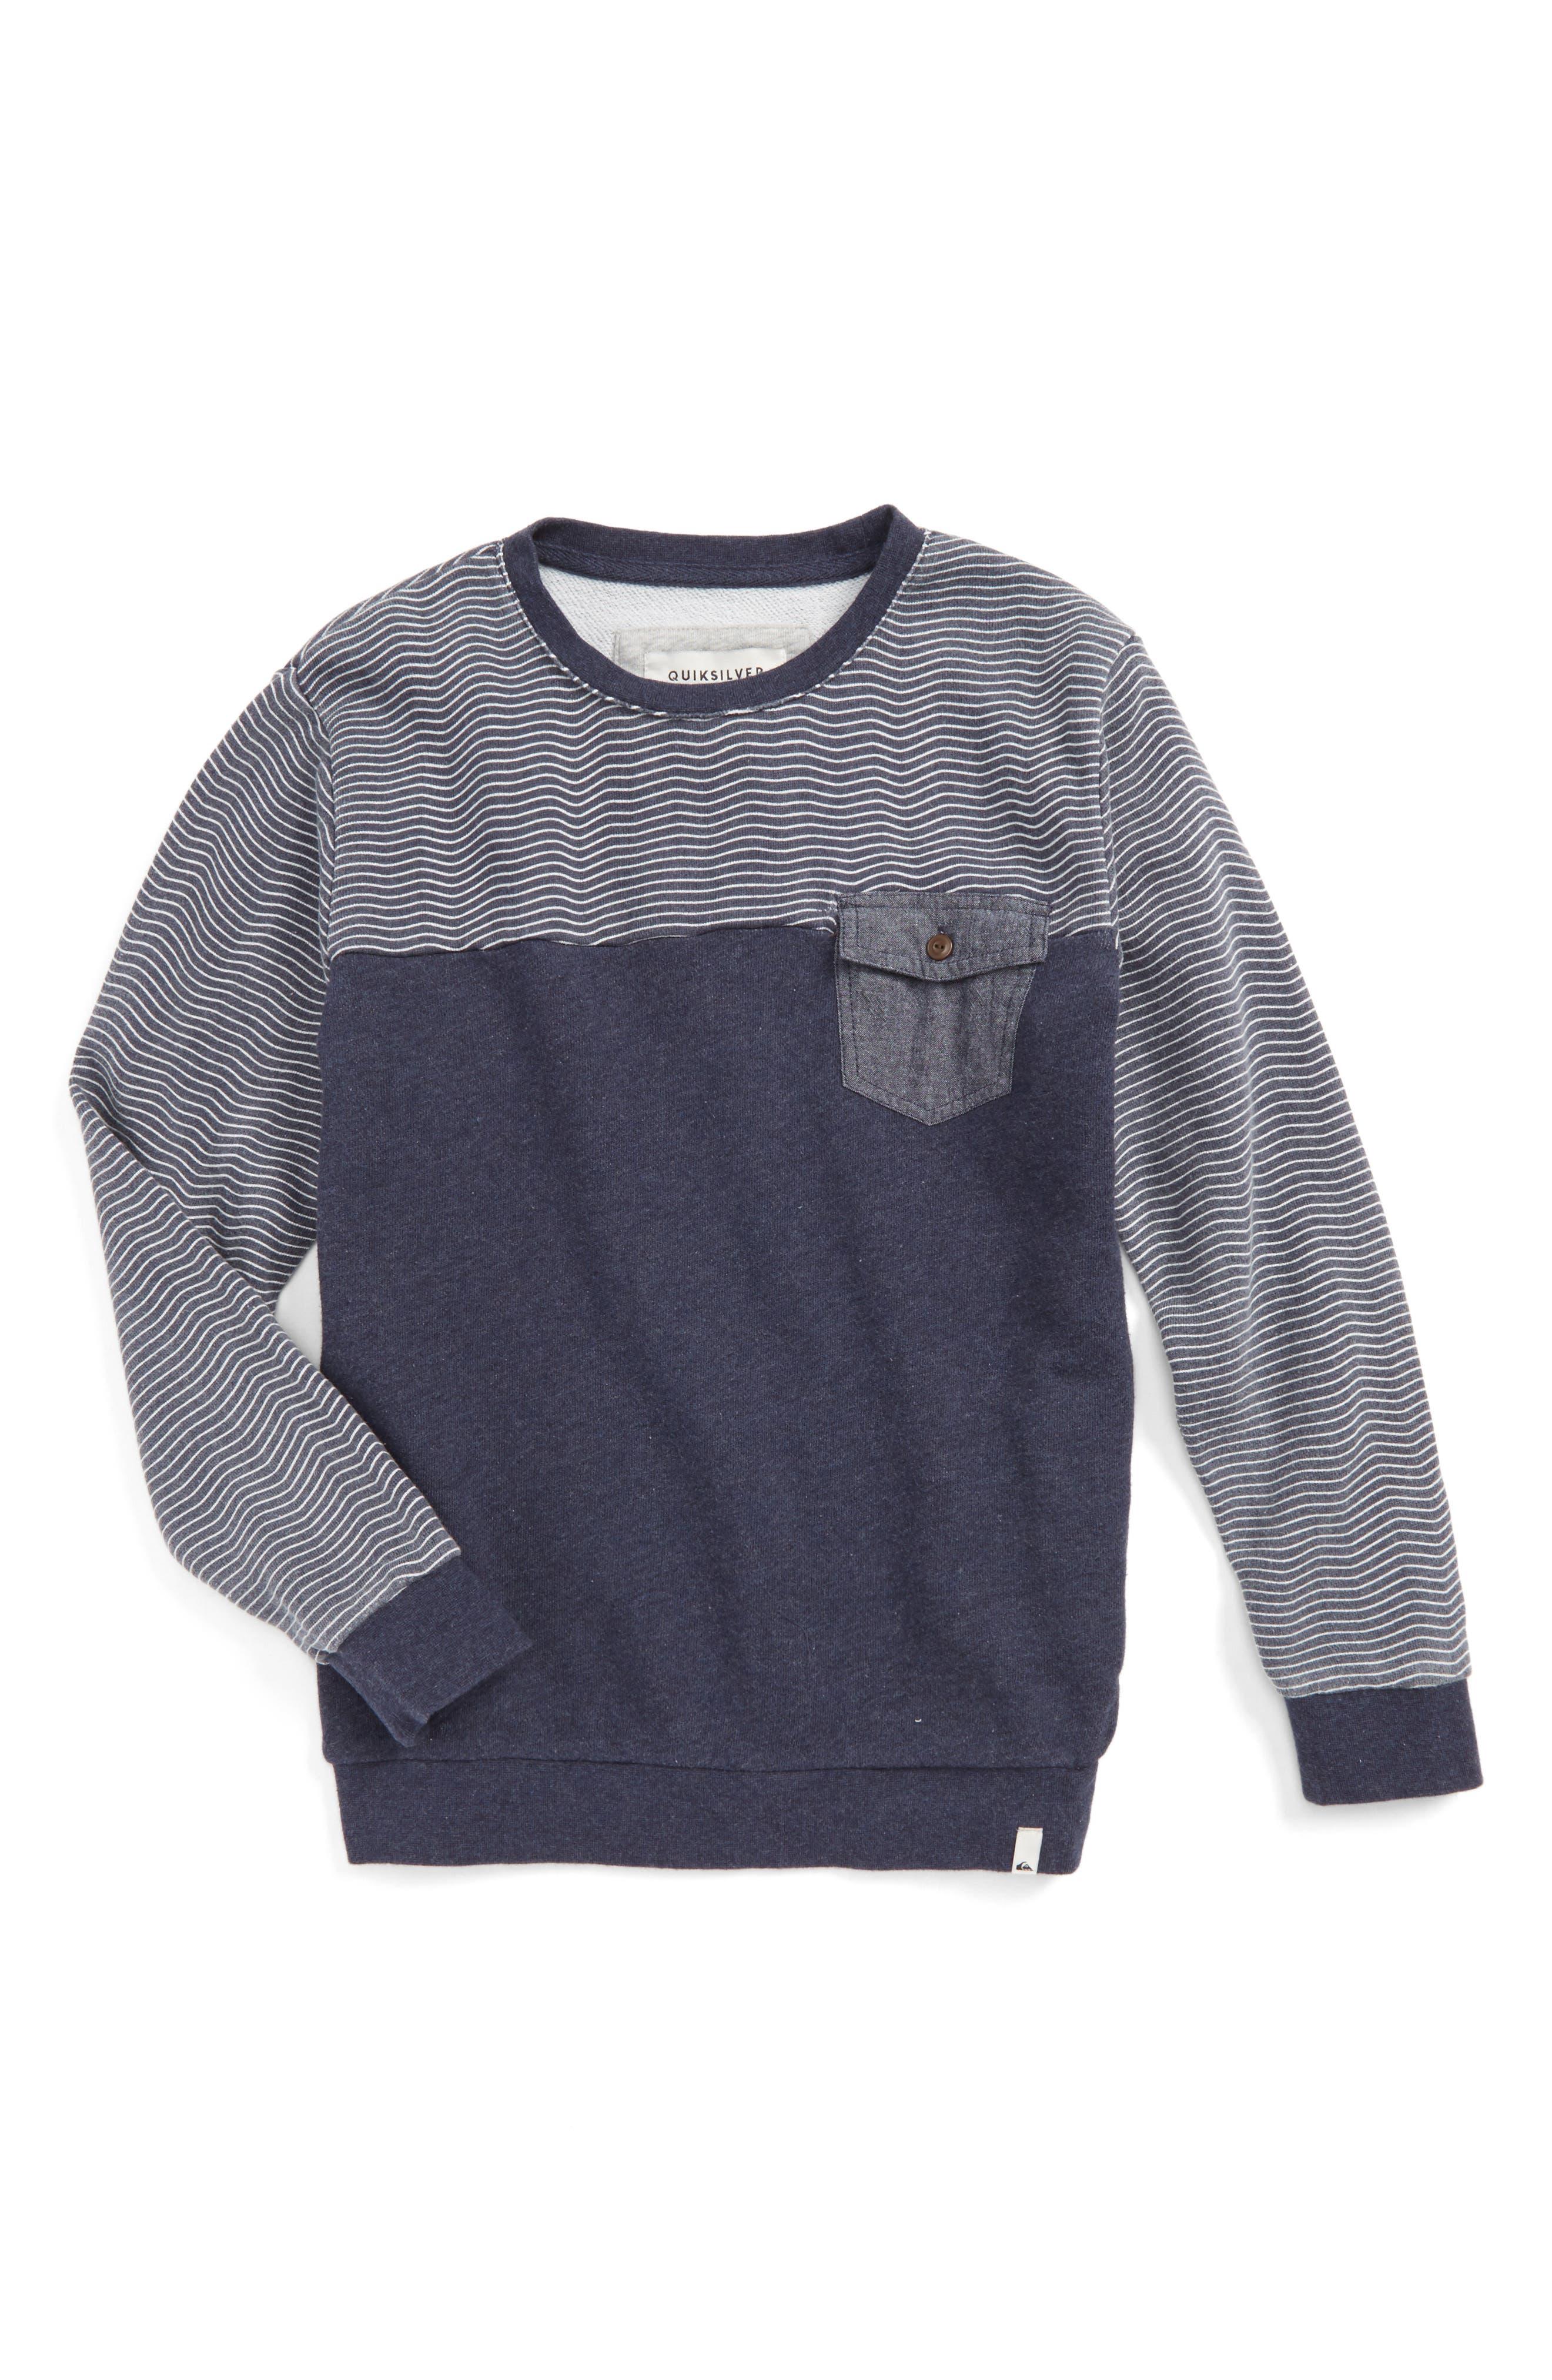 QUIKSILVER Mahatao French Terry Sweatshirt